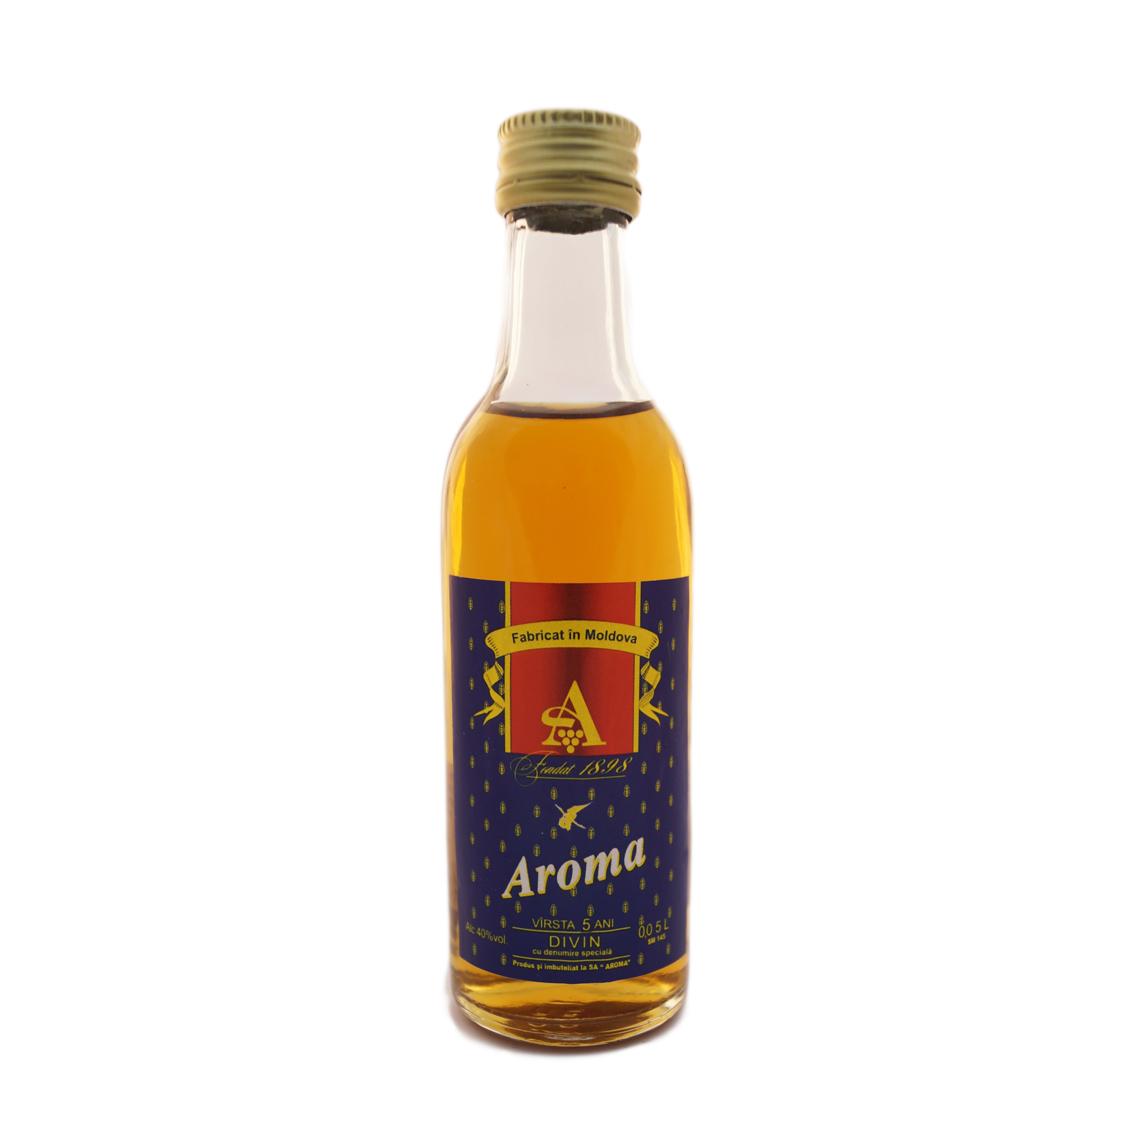 BRANDY-DIVIN-AROMA-5-STAR